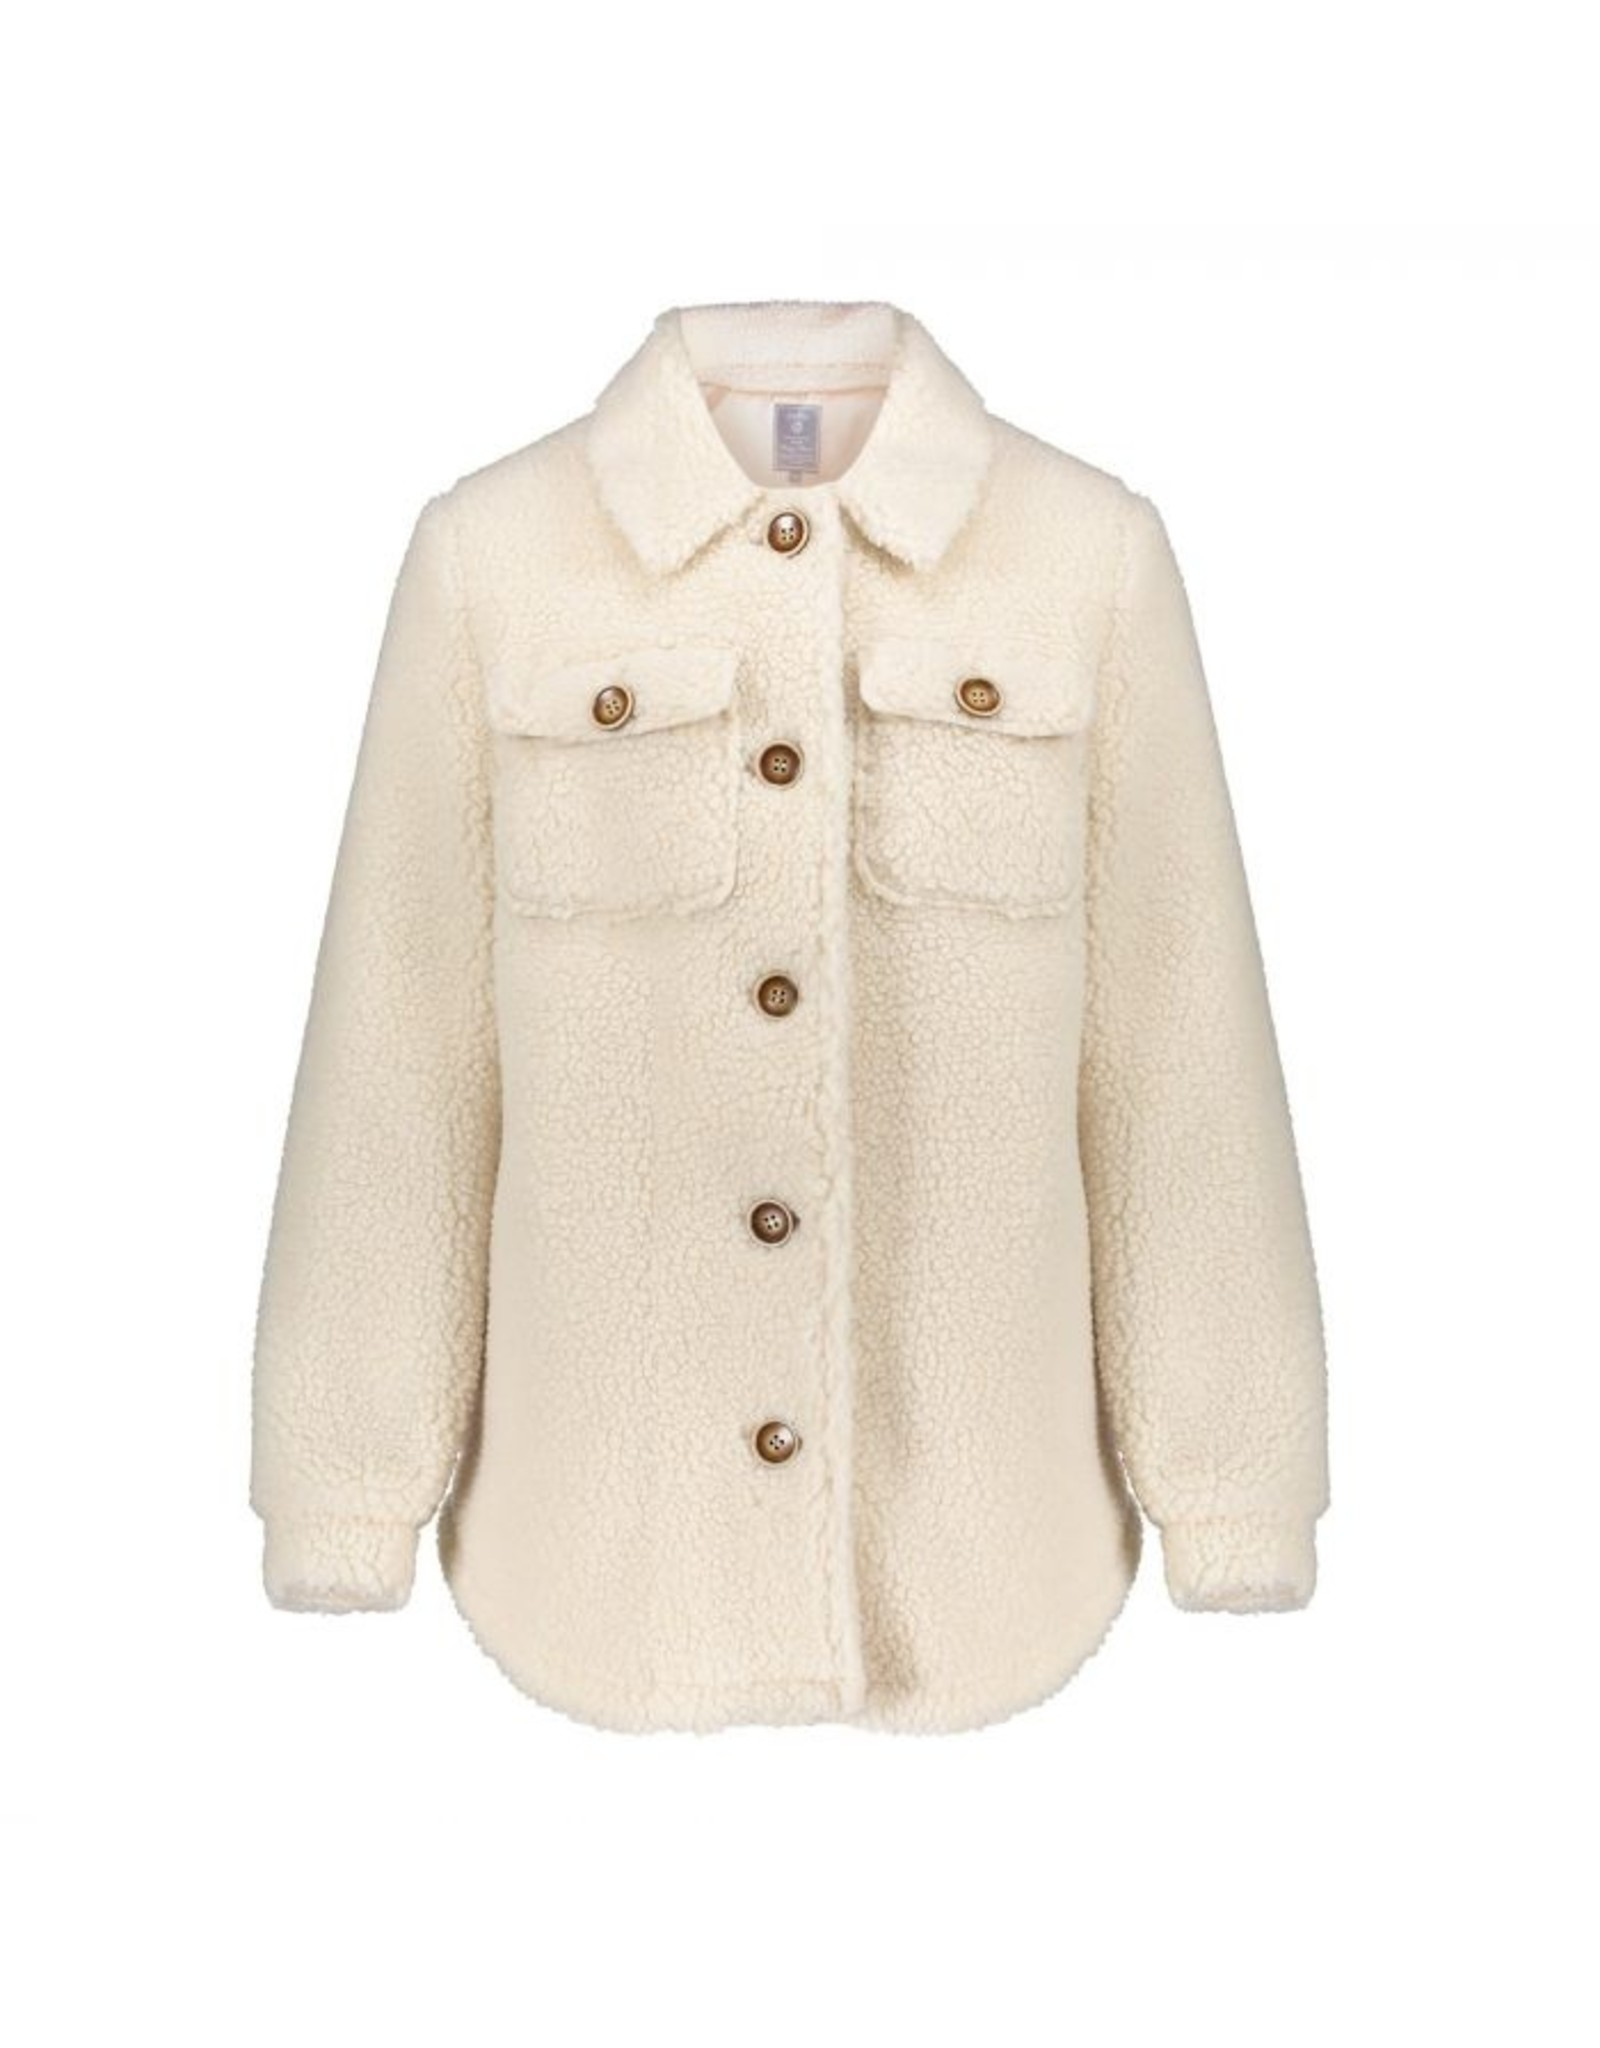 Geisha Teddy coat button closure